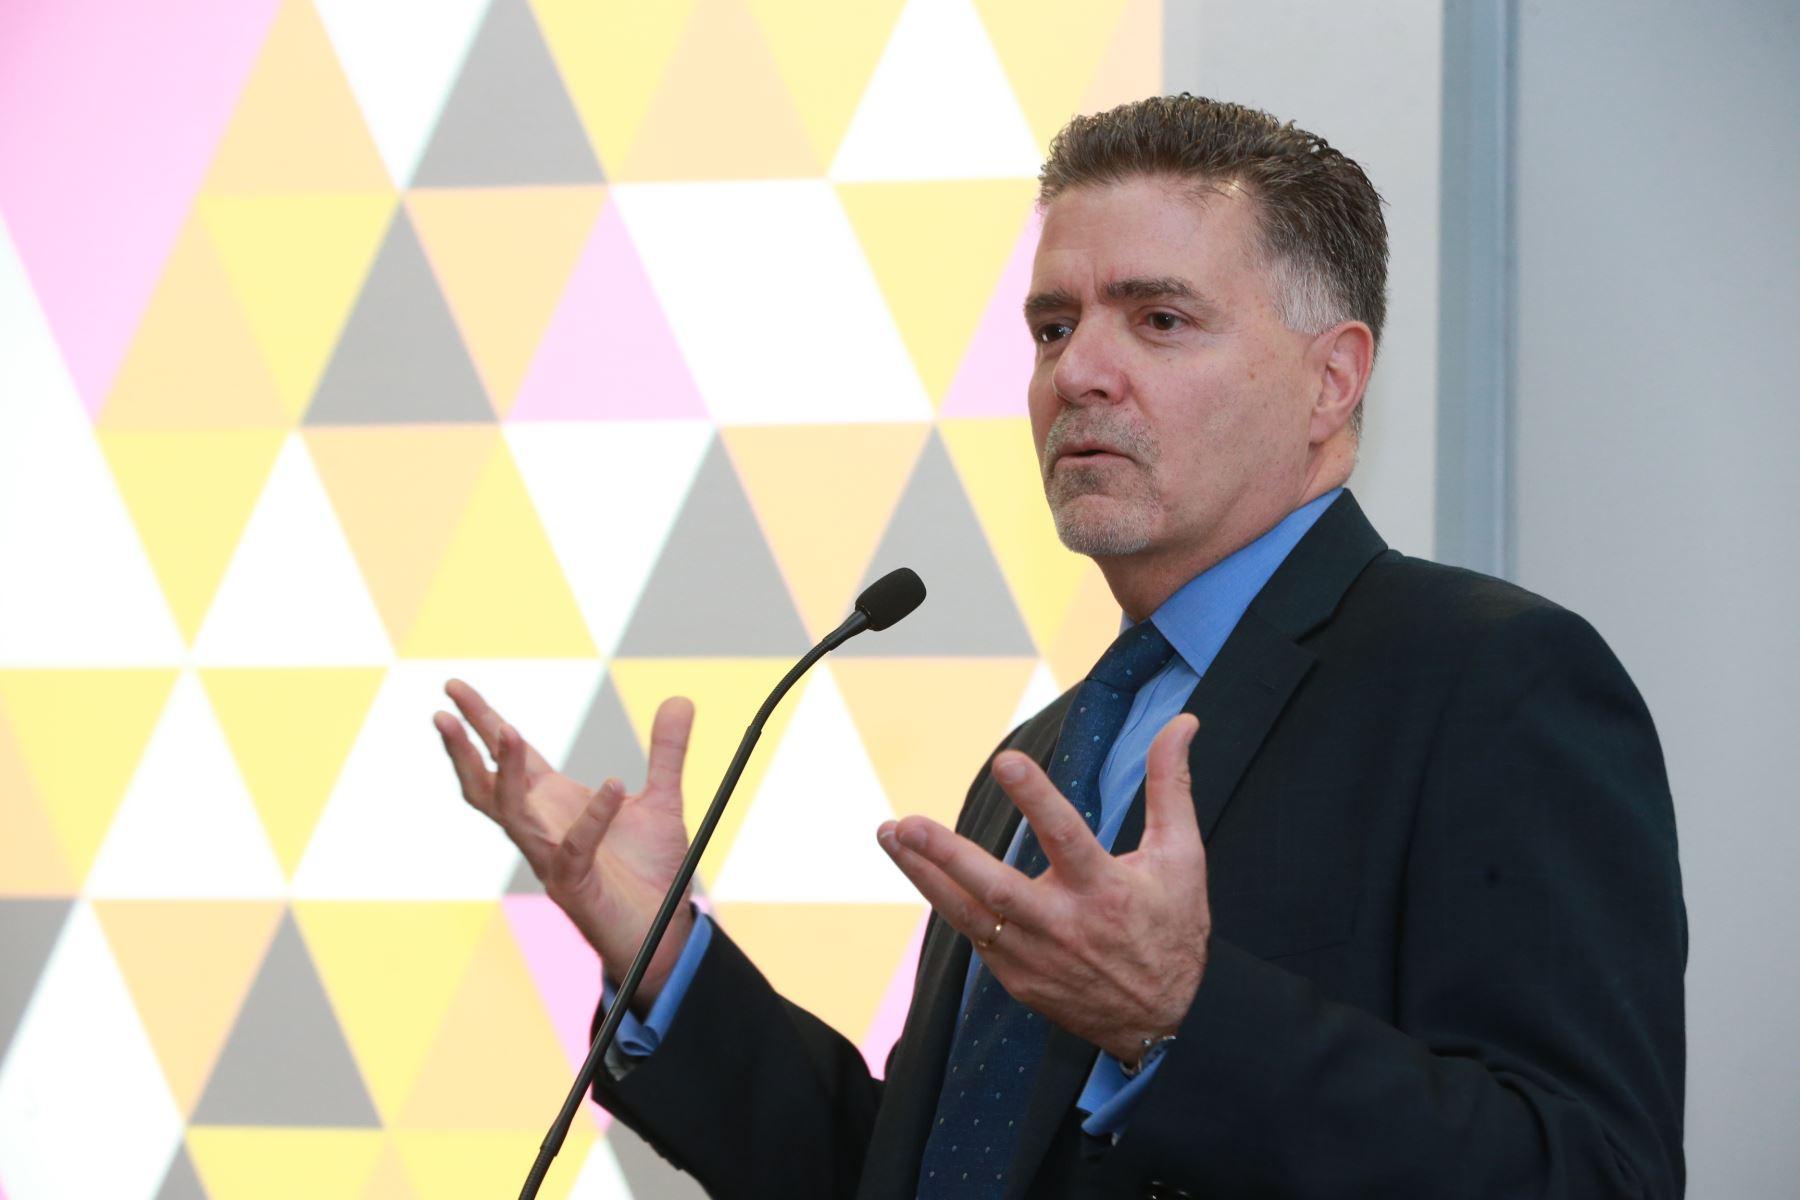 Jefe de la Superintendencia del Mercado de Valores (SMV). Foto: ANDINA/Norman Córdova